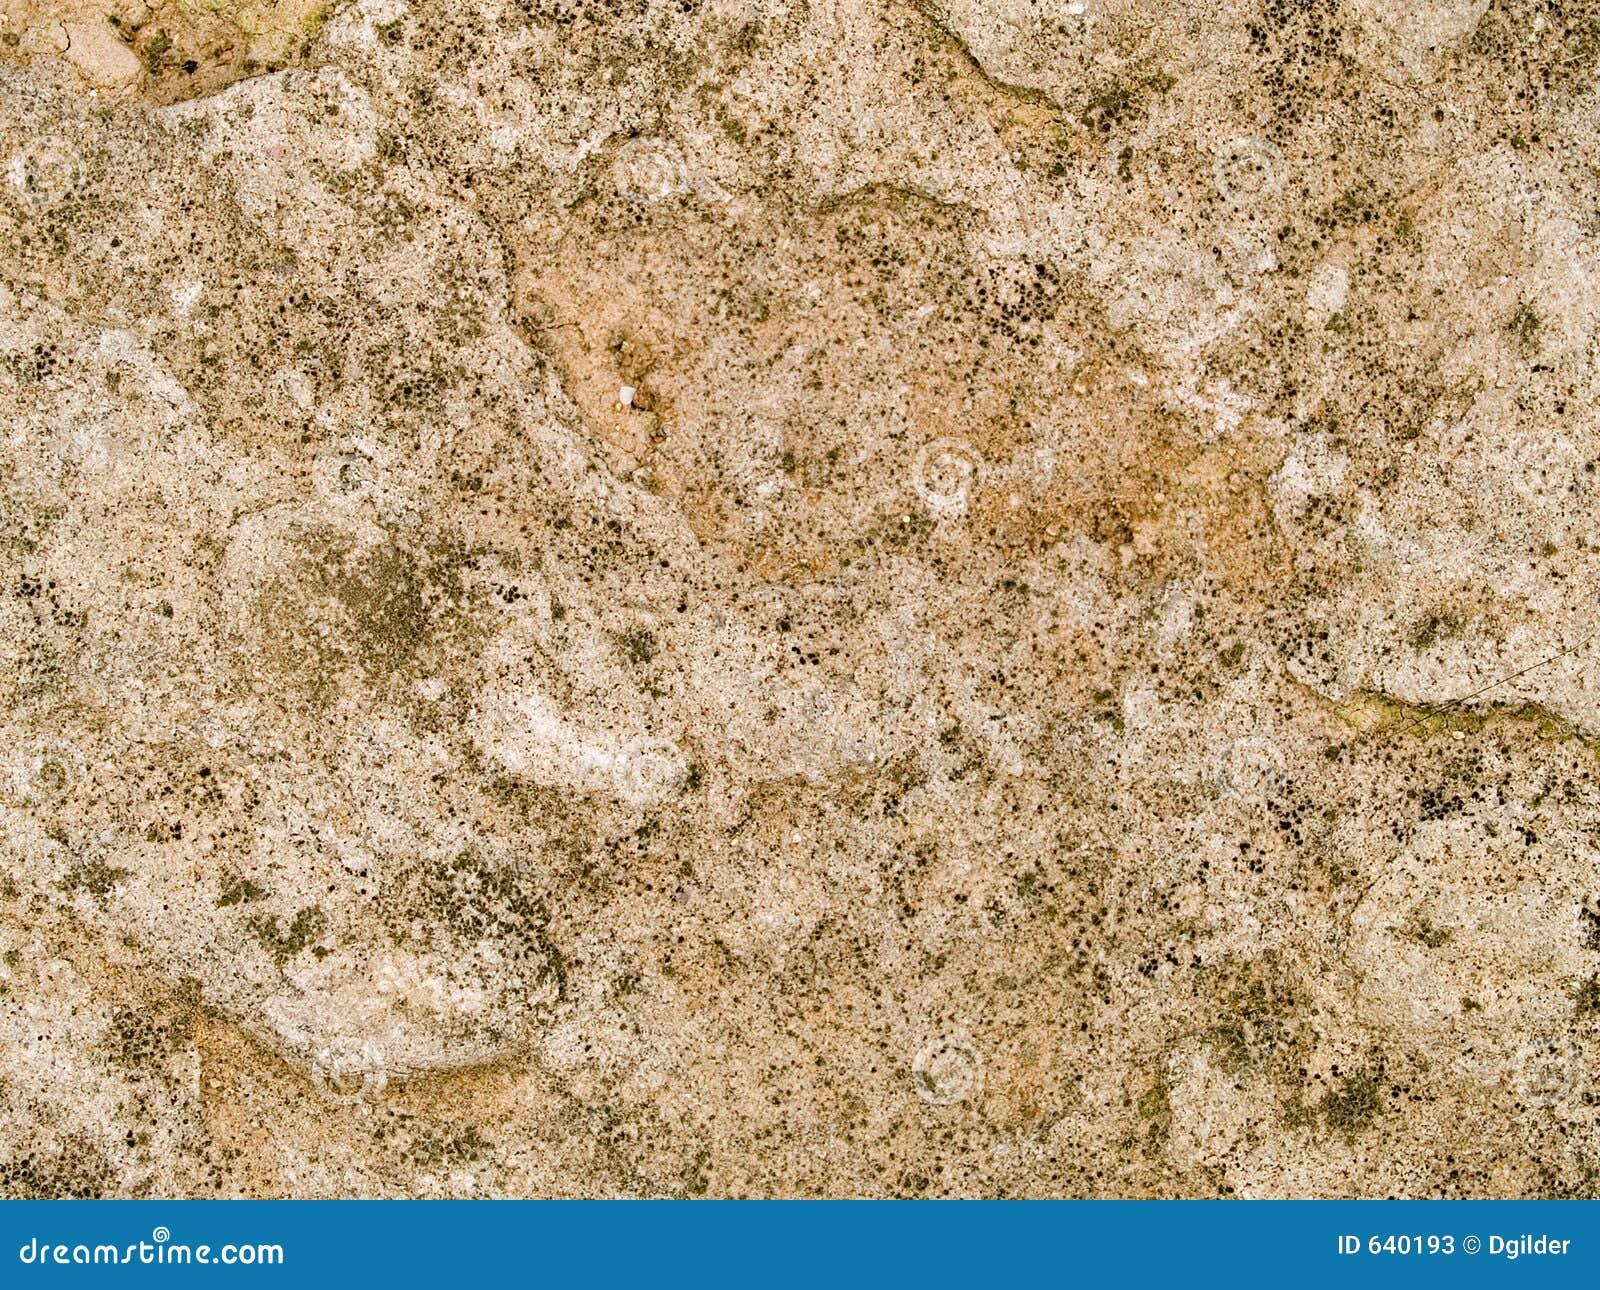 Download Mottled текстура макроса - камень - Стоковое Изображение - изображение насчитывающей макрос, деталь: 640193